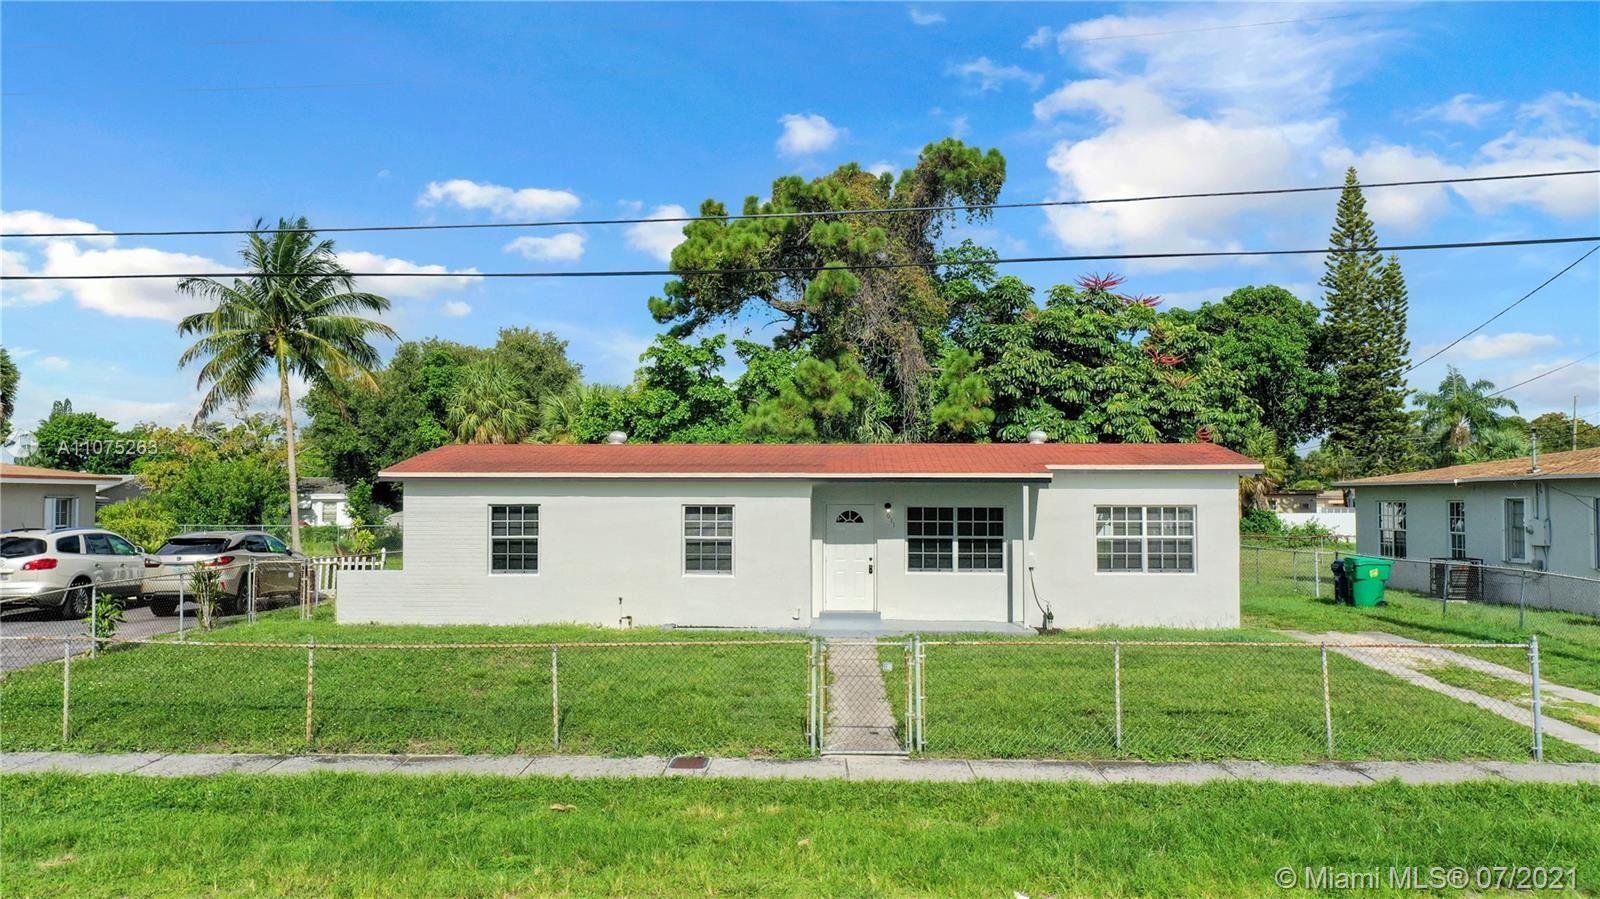 Photo of 611 NW 34th Ter, Lauderhill, FL 33311 (MLS # A11075263)